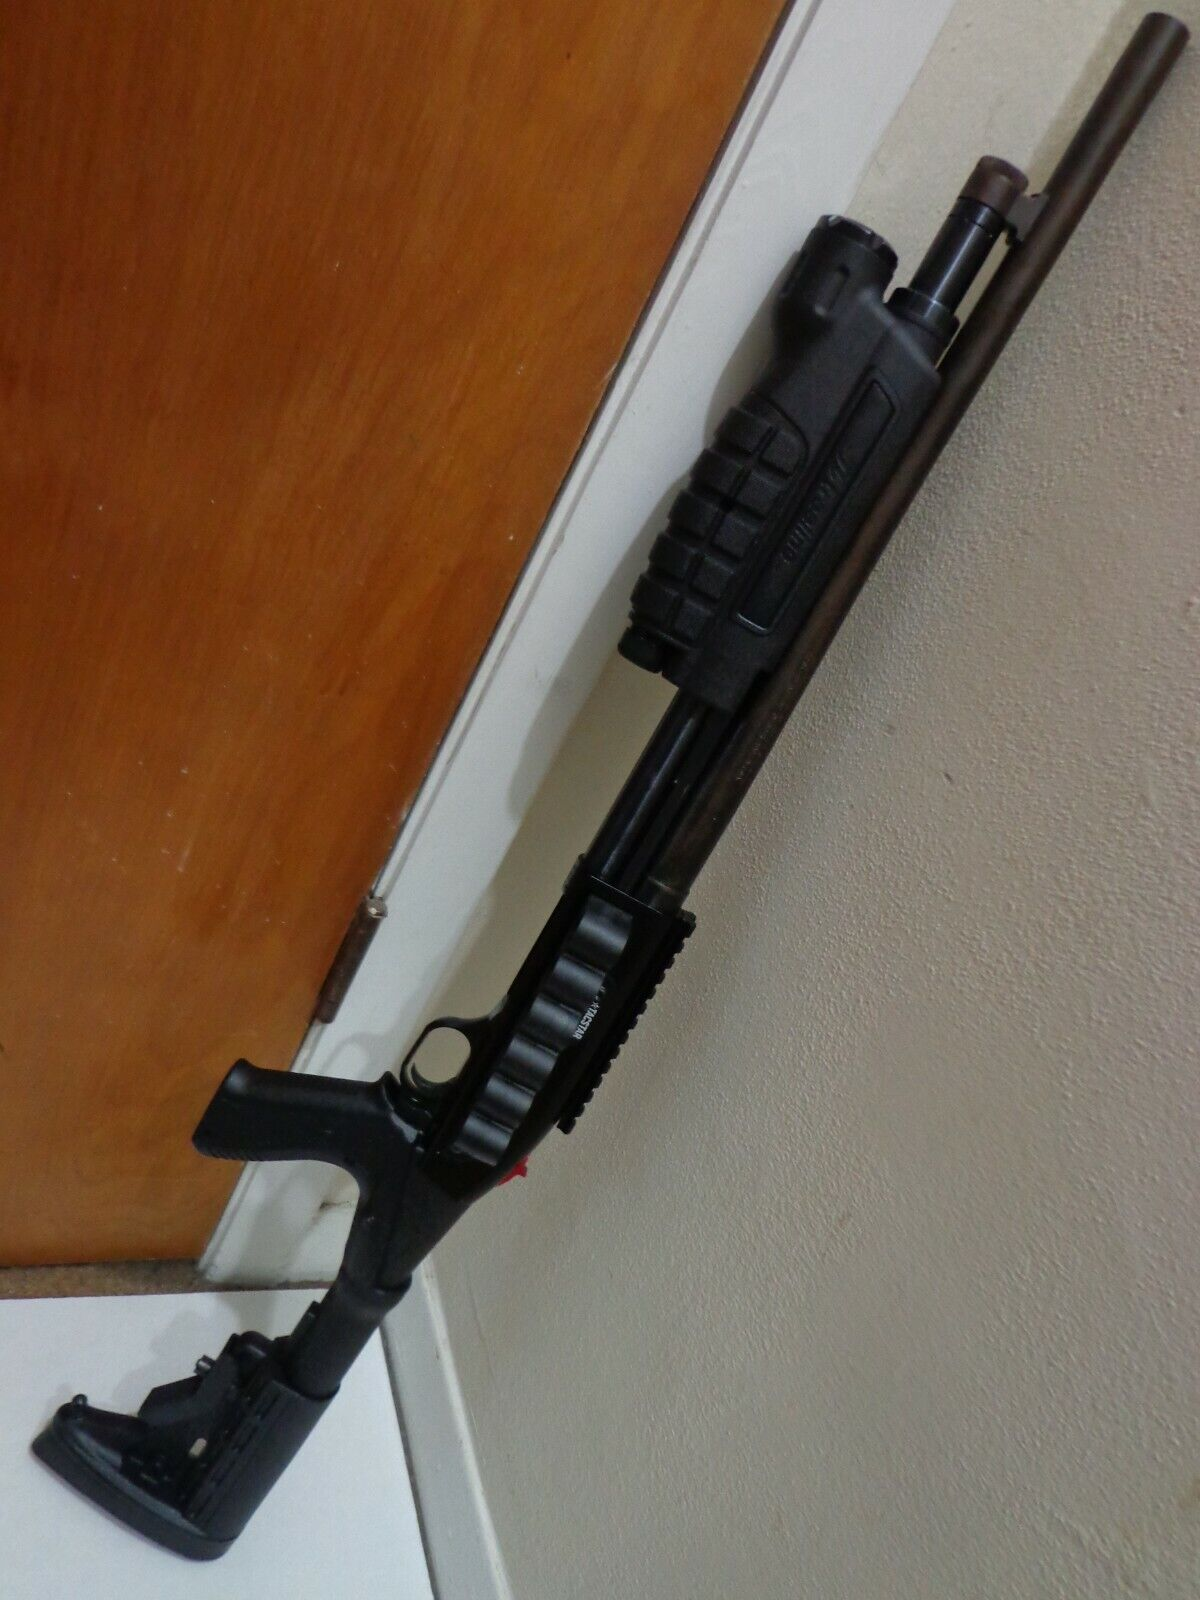 Treeline Forend Tactical Light Mossberg 500 12 Gauge Shotgun 900 Lumen NEW - $44.00